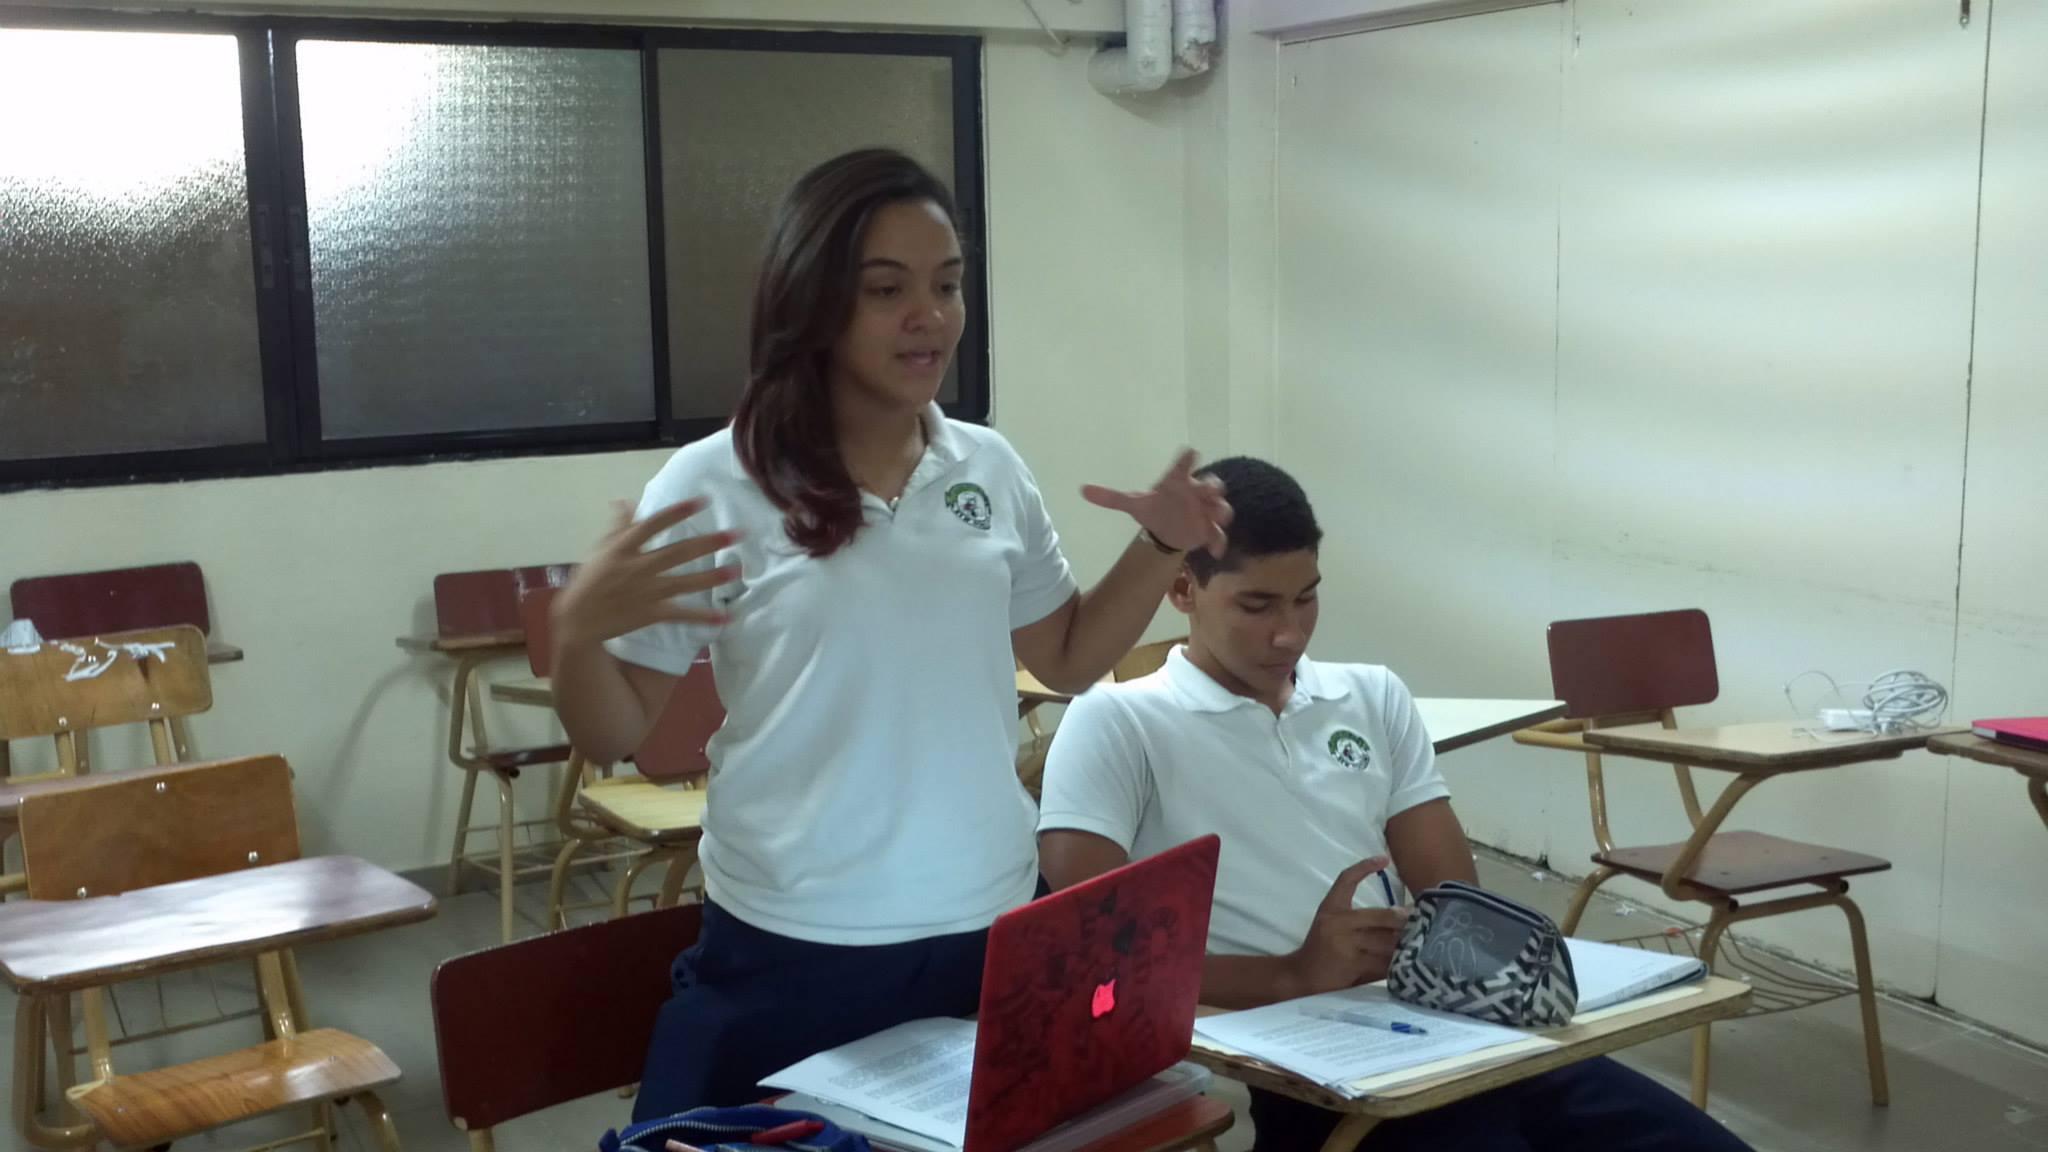 Debate grows in the Dominican Republic